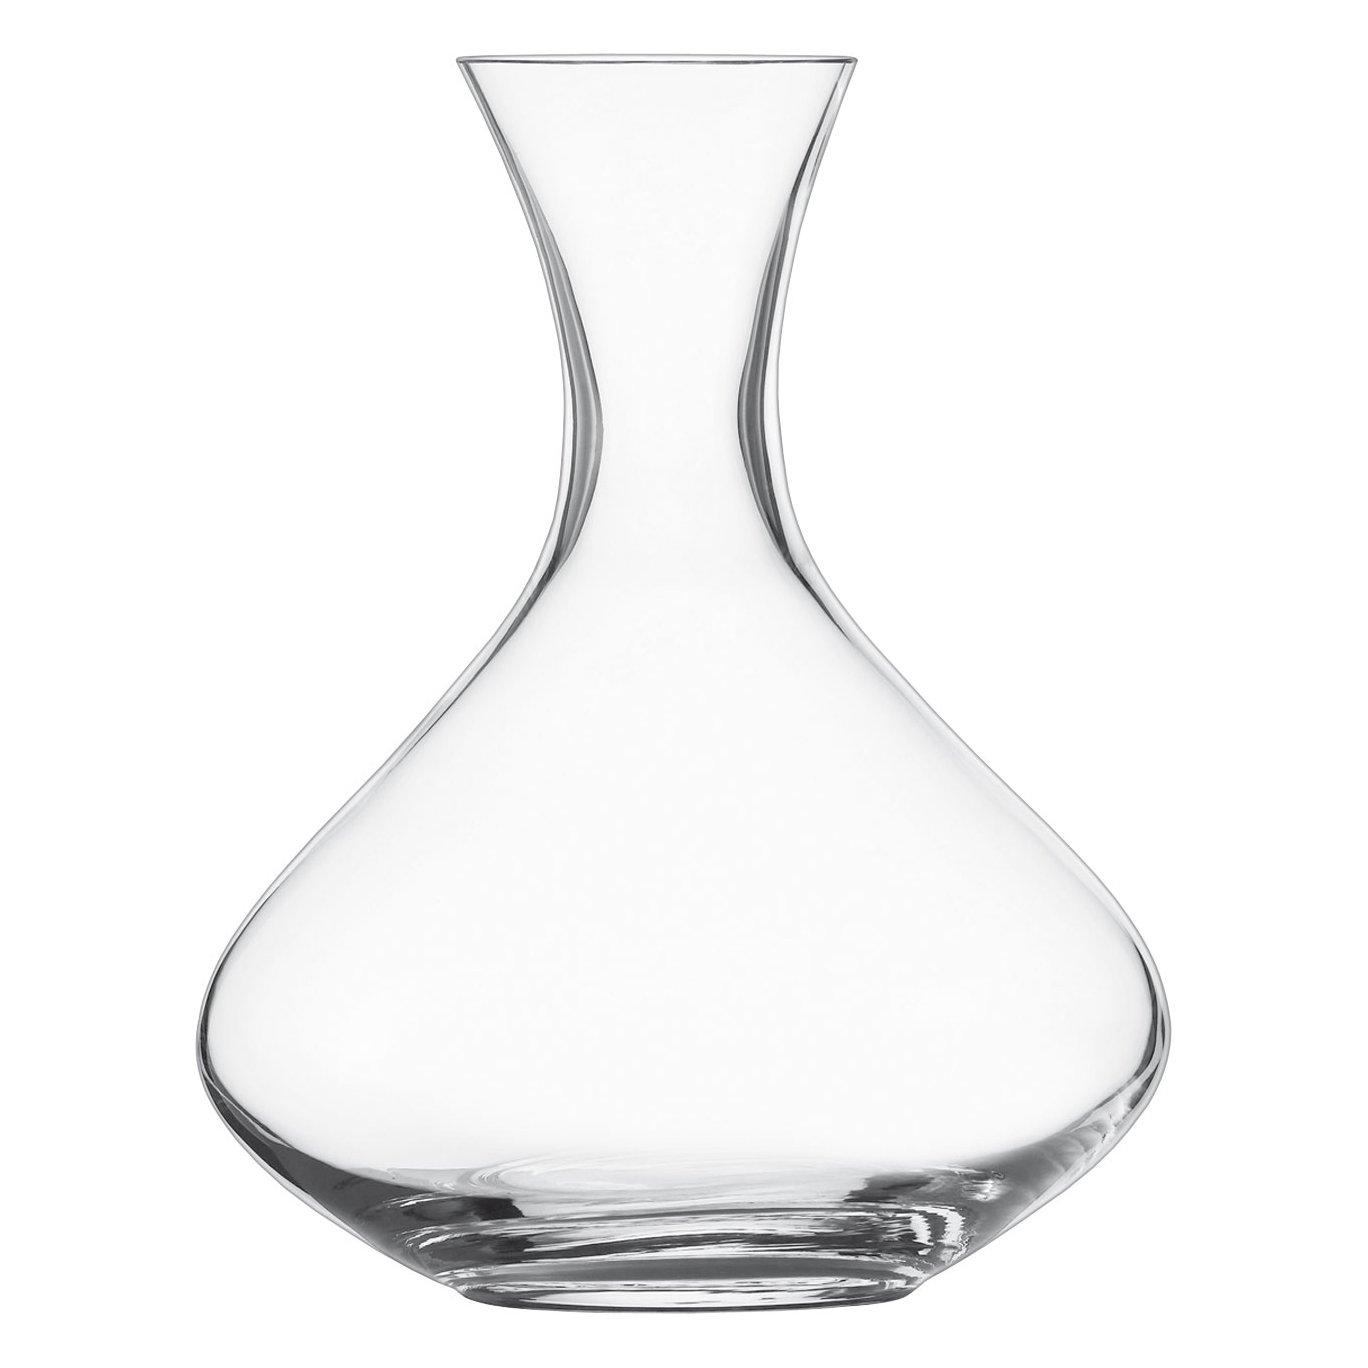 Schott Zwiesel Tritan Crystal Glass Cru Classic Collection 3/4-Liter Magnum Decanter